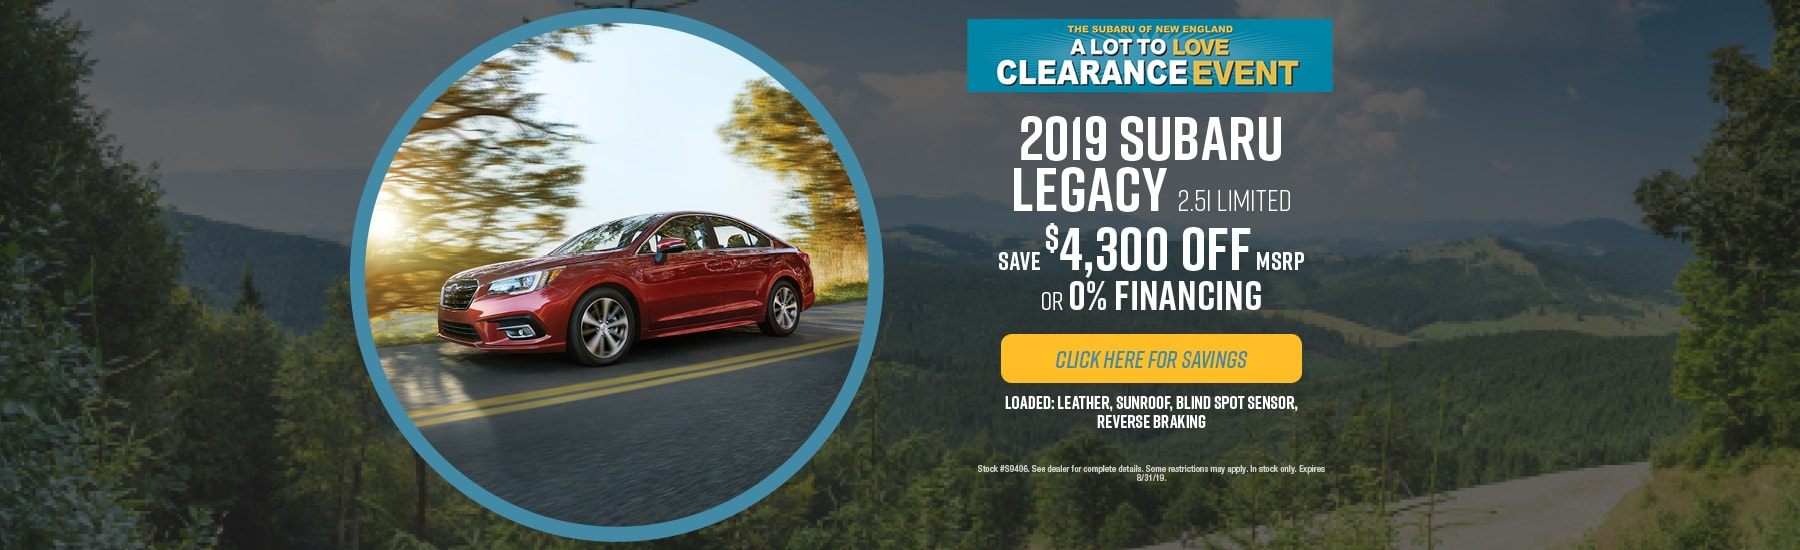 Subaru Dealers In Ct >> Secor Subaru Dealership In New London Ct Subaru Cars For Sale